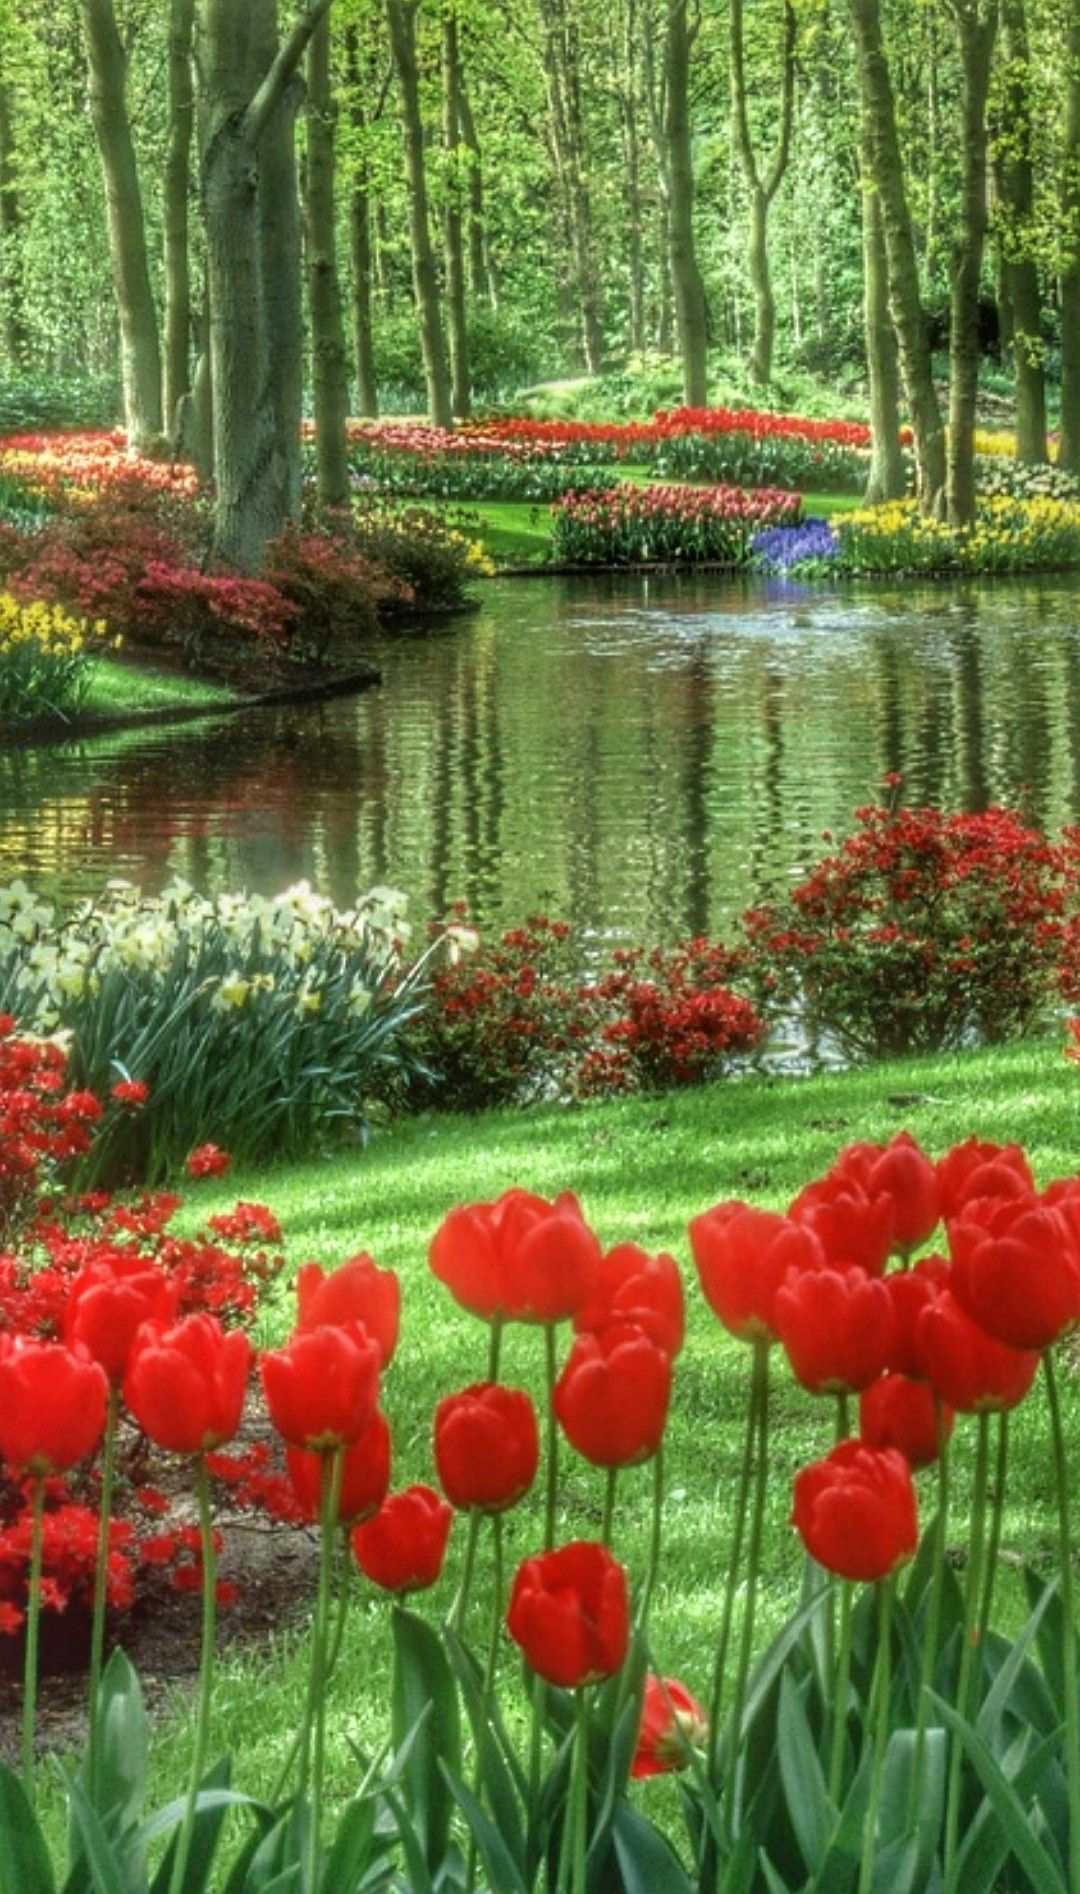 Hermosas Flores Wichi 2 Cosas De Este Mundo Material Fotografia